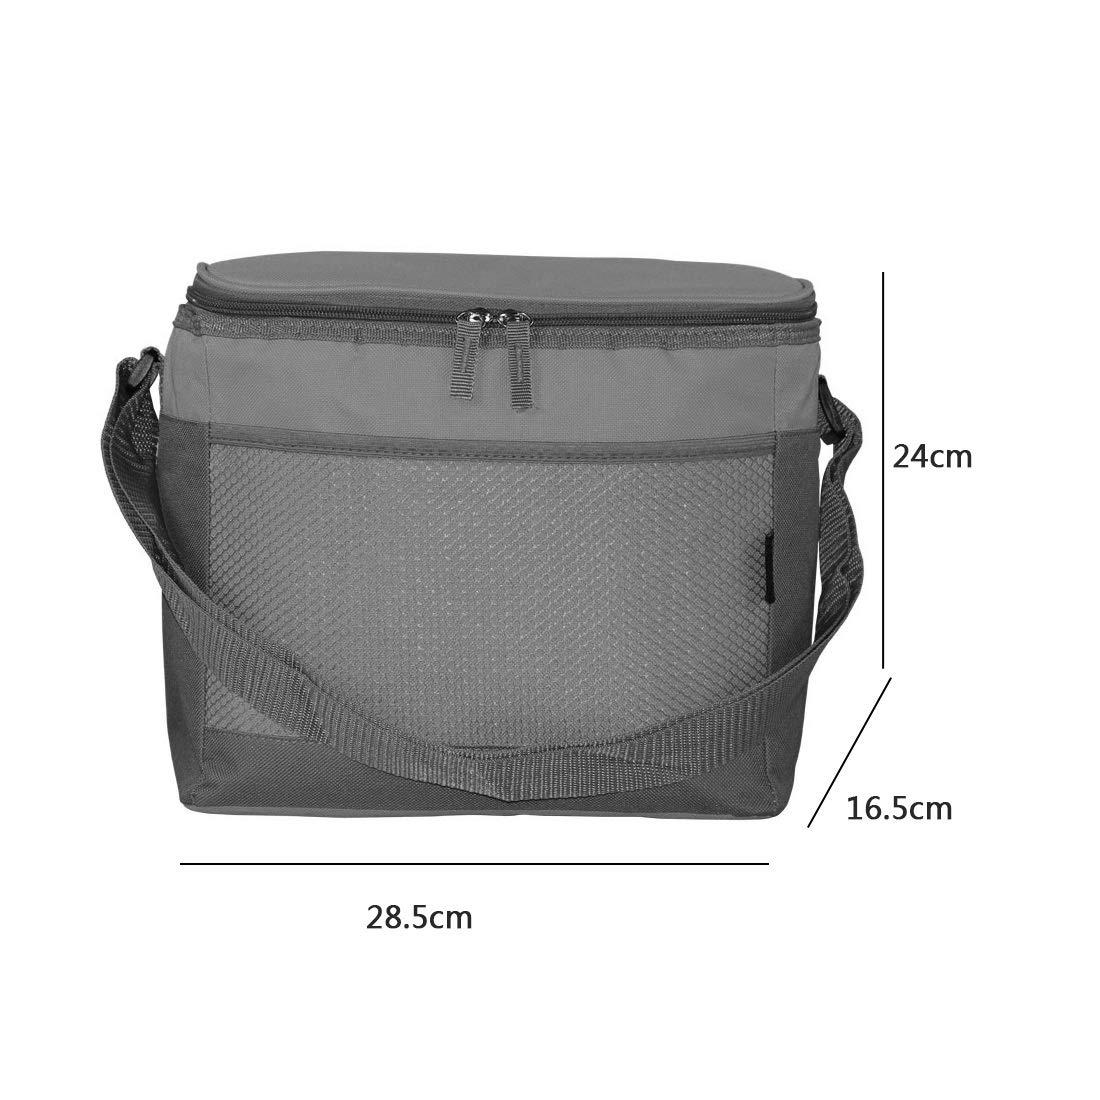 LWBAG FW Isolationspaket, Tragbares Picknick Picknick Picknick Im Freien Isolationskaltes Frischepaket Office School Lunchpaket, 28,5 × 16,5 × 24 cm (Farbe   Grün) B07Q7Y9T72 Taschen Hohe Sicherheit 51a7cb